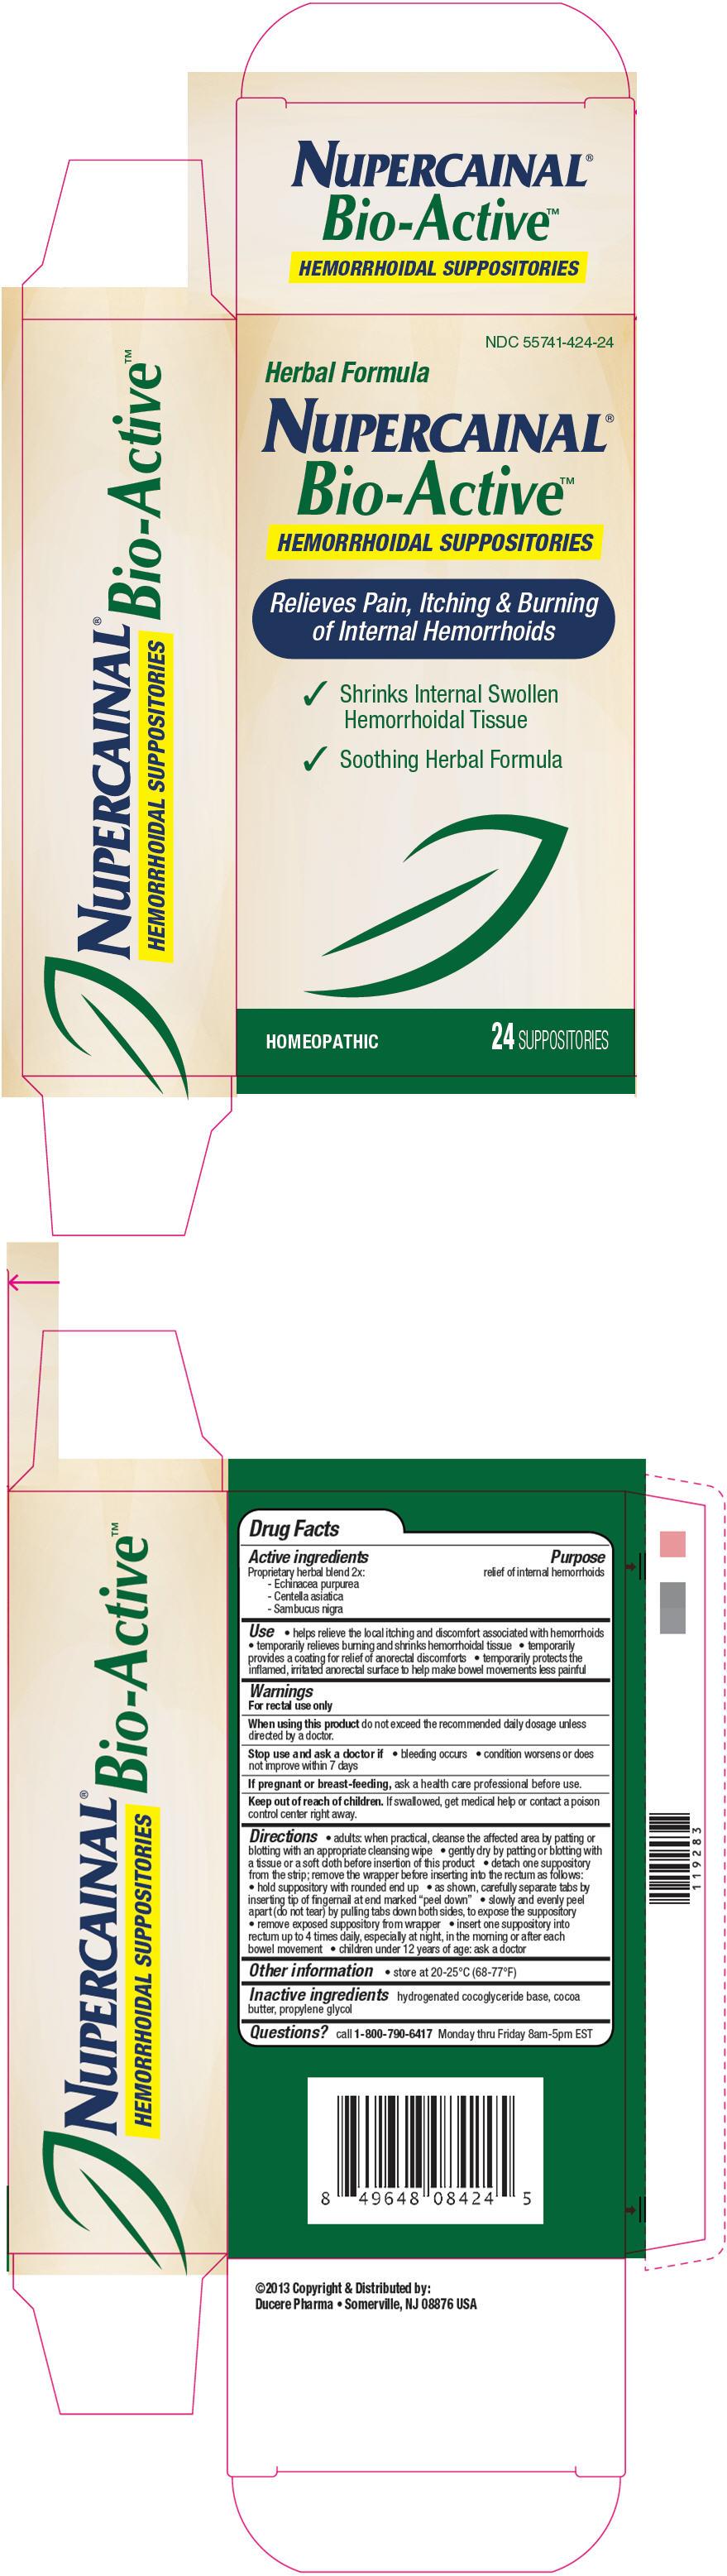 Nupercainal Bio-active Hemorrhoidal (Echinacea Purpurea, Centella Asiatica, And Sambucus Nigra Flowering Top) Suppository [Ducere Pharma]